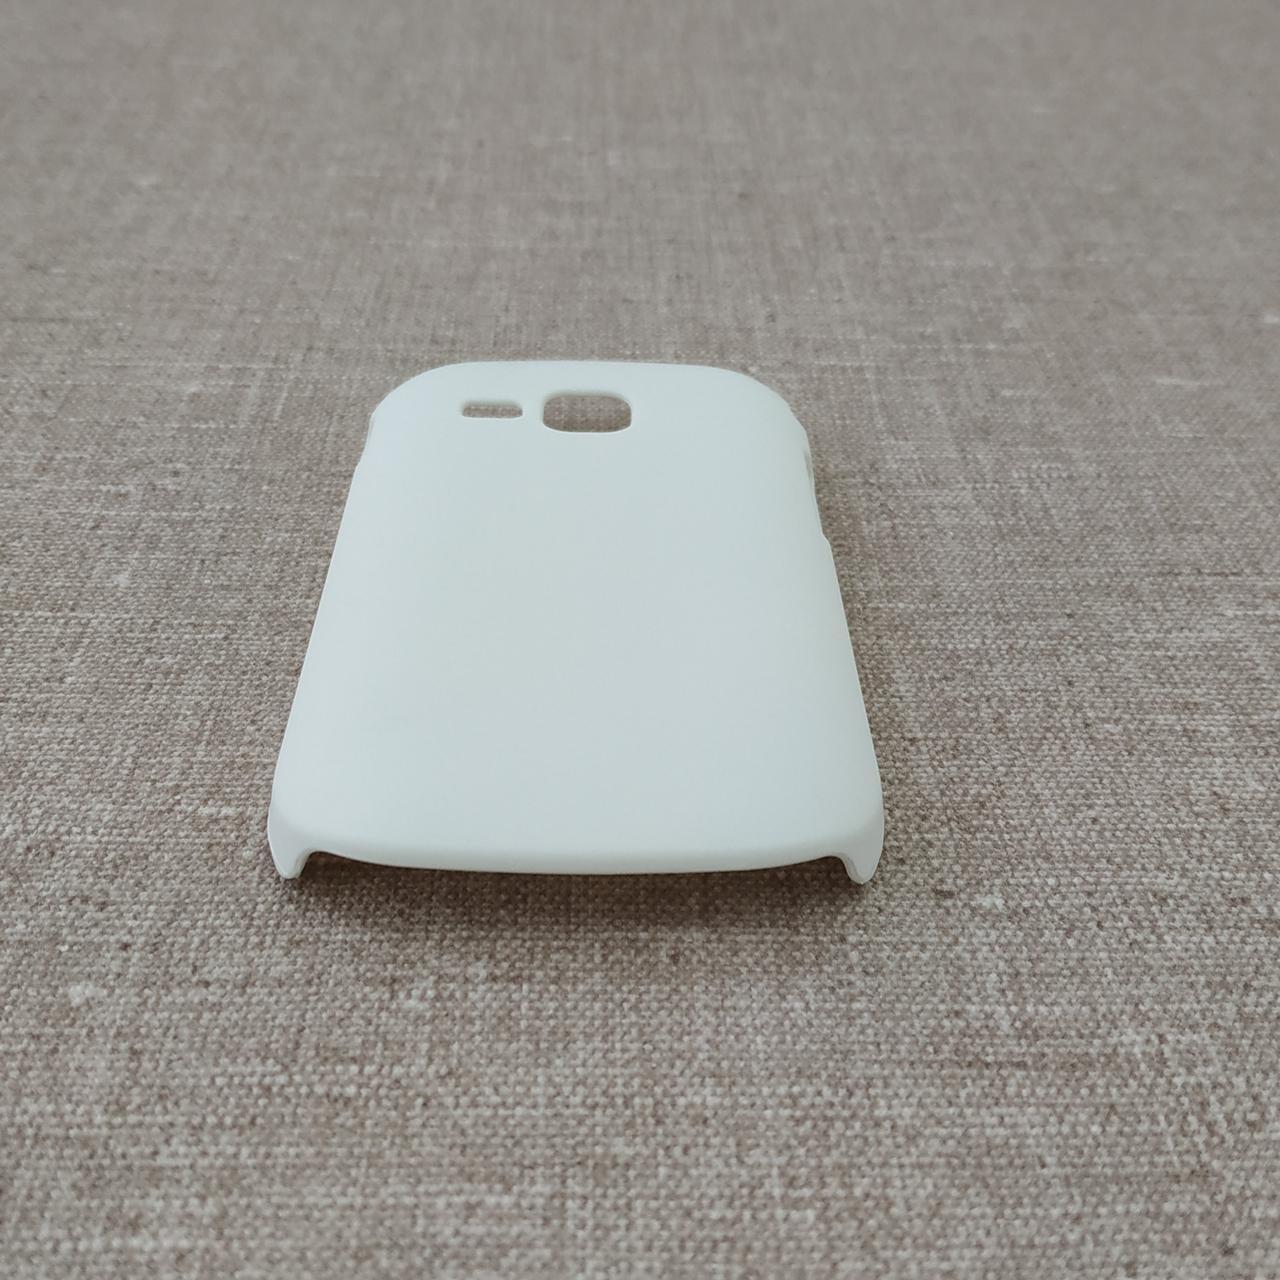 Чехол Essence Harrison Samsung S5292 white Для телефона Rex Duos